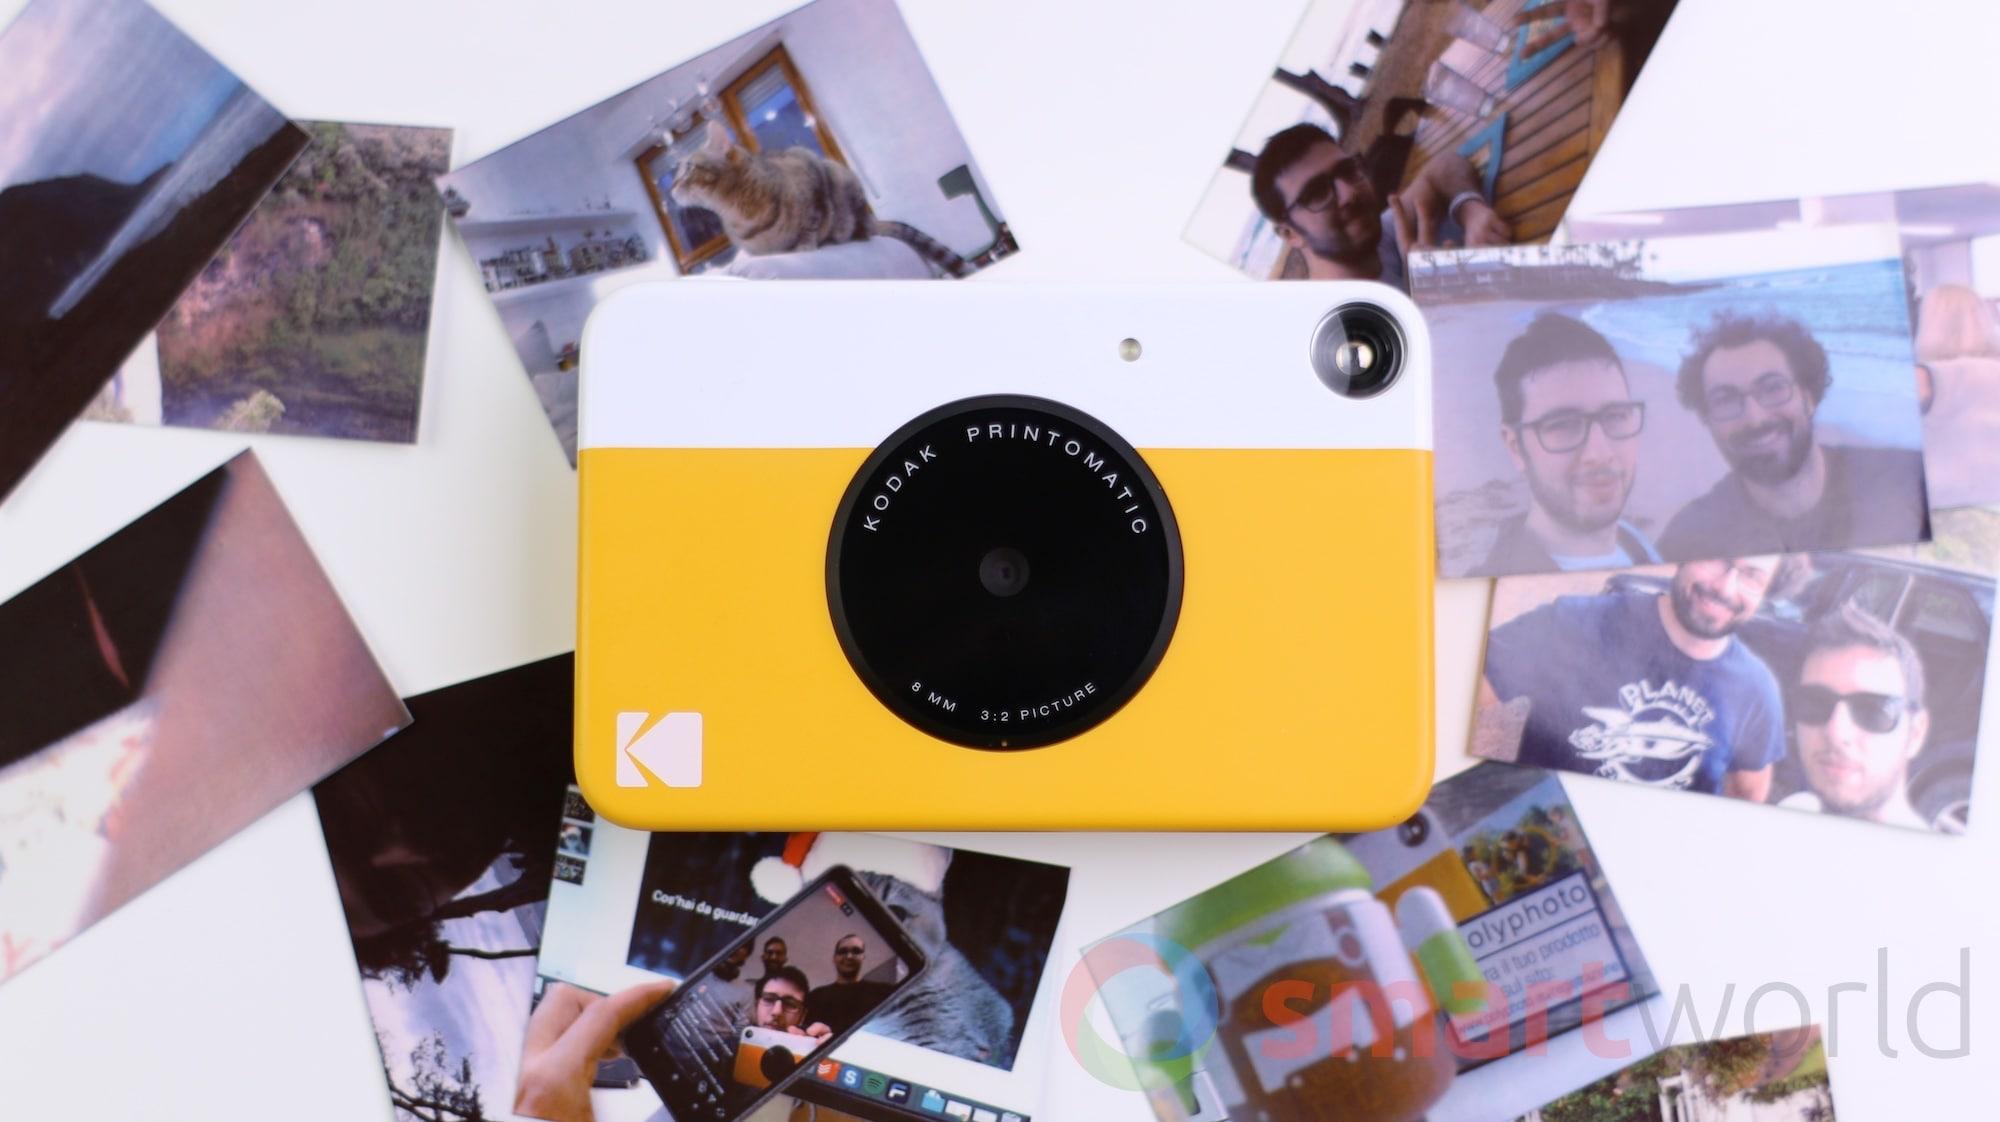 Kodak Printomatic – 2